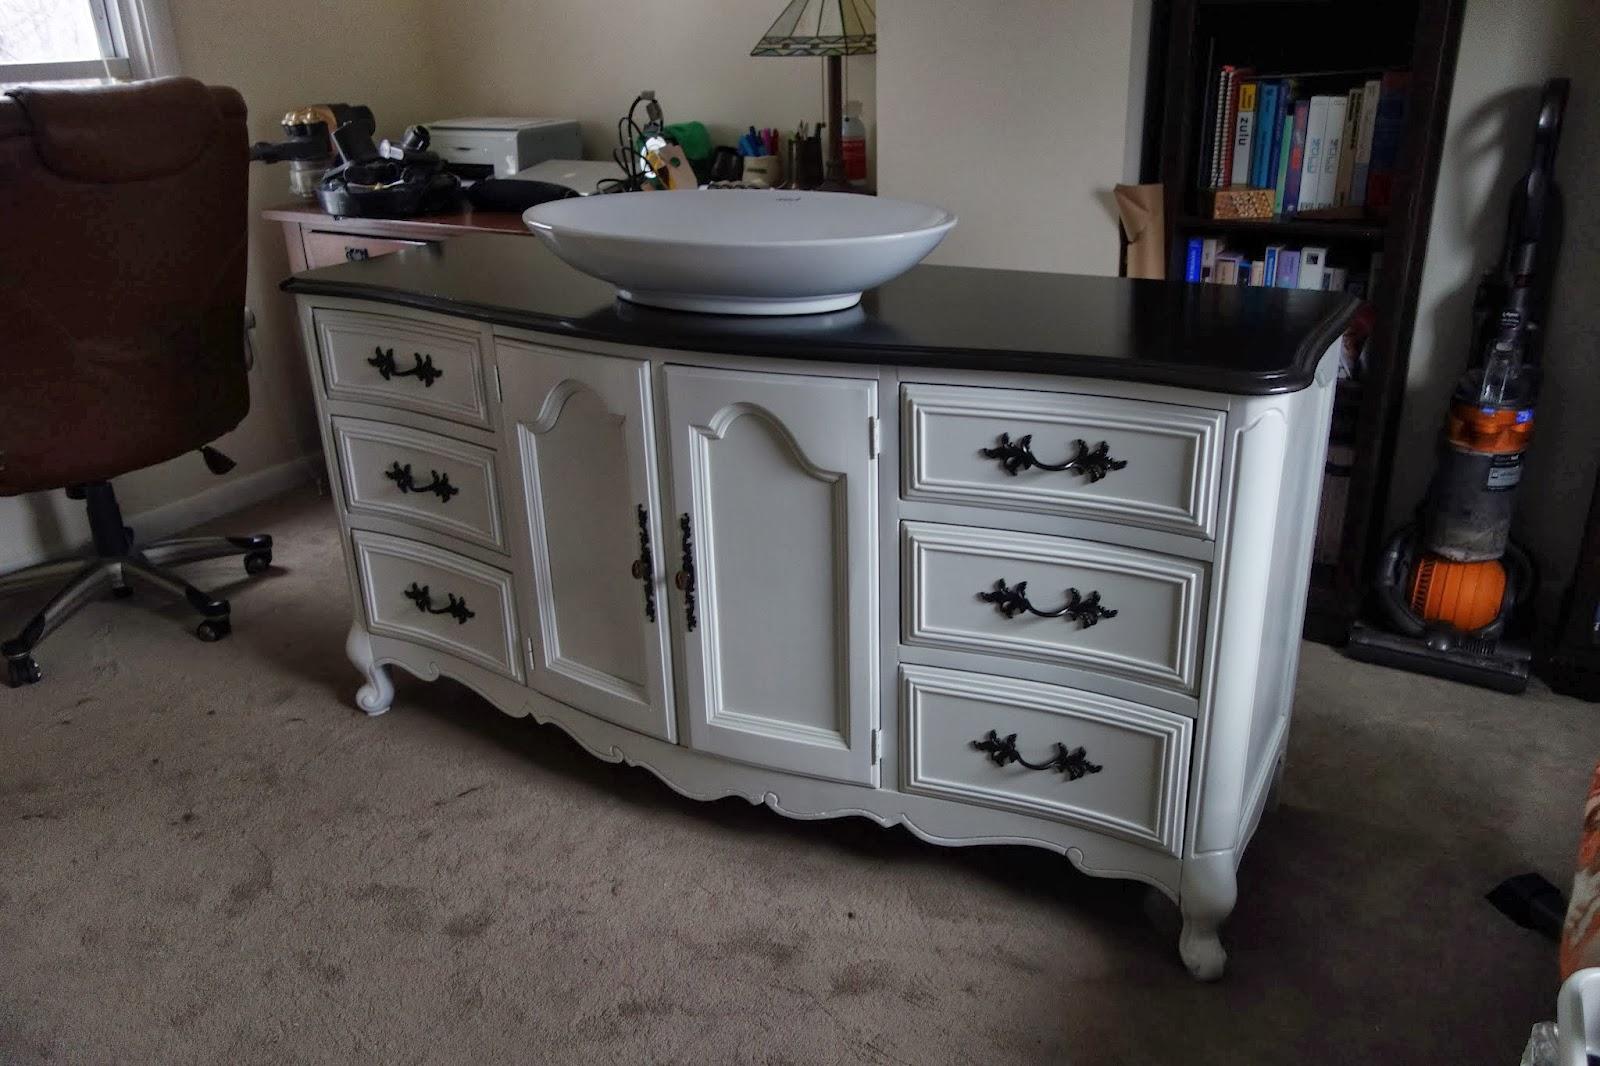 Rustyfarmhouse Diy Repurposing A Buffet Or Dresser As A Bathroom Vanity Part 2